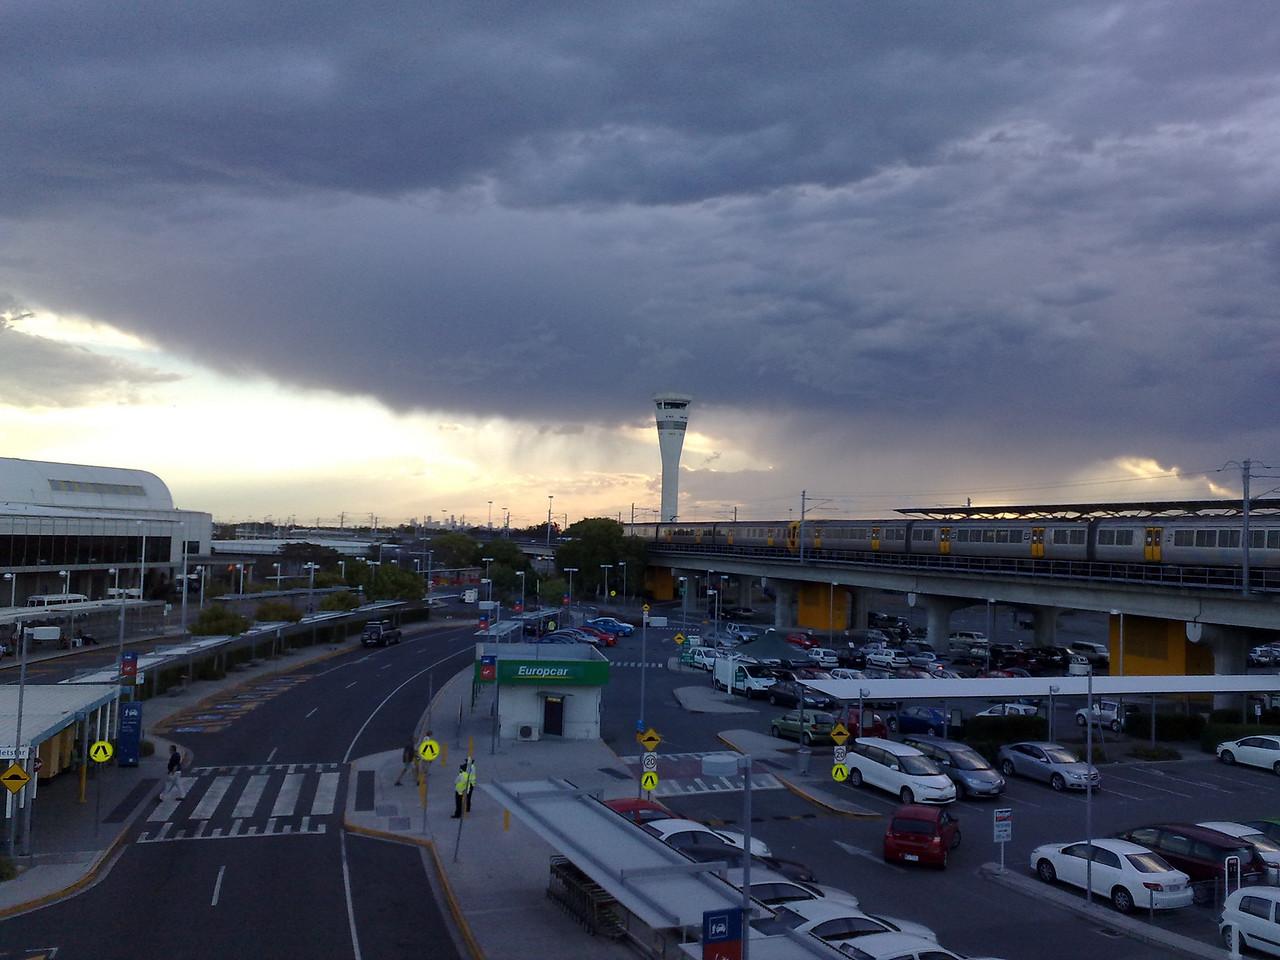 20091024_1807_1036 Storm coming across Brisbane airport.